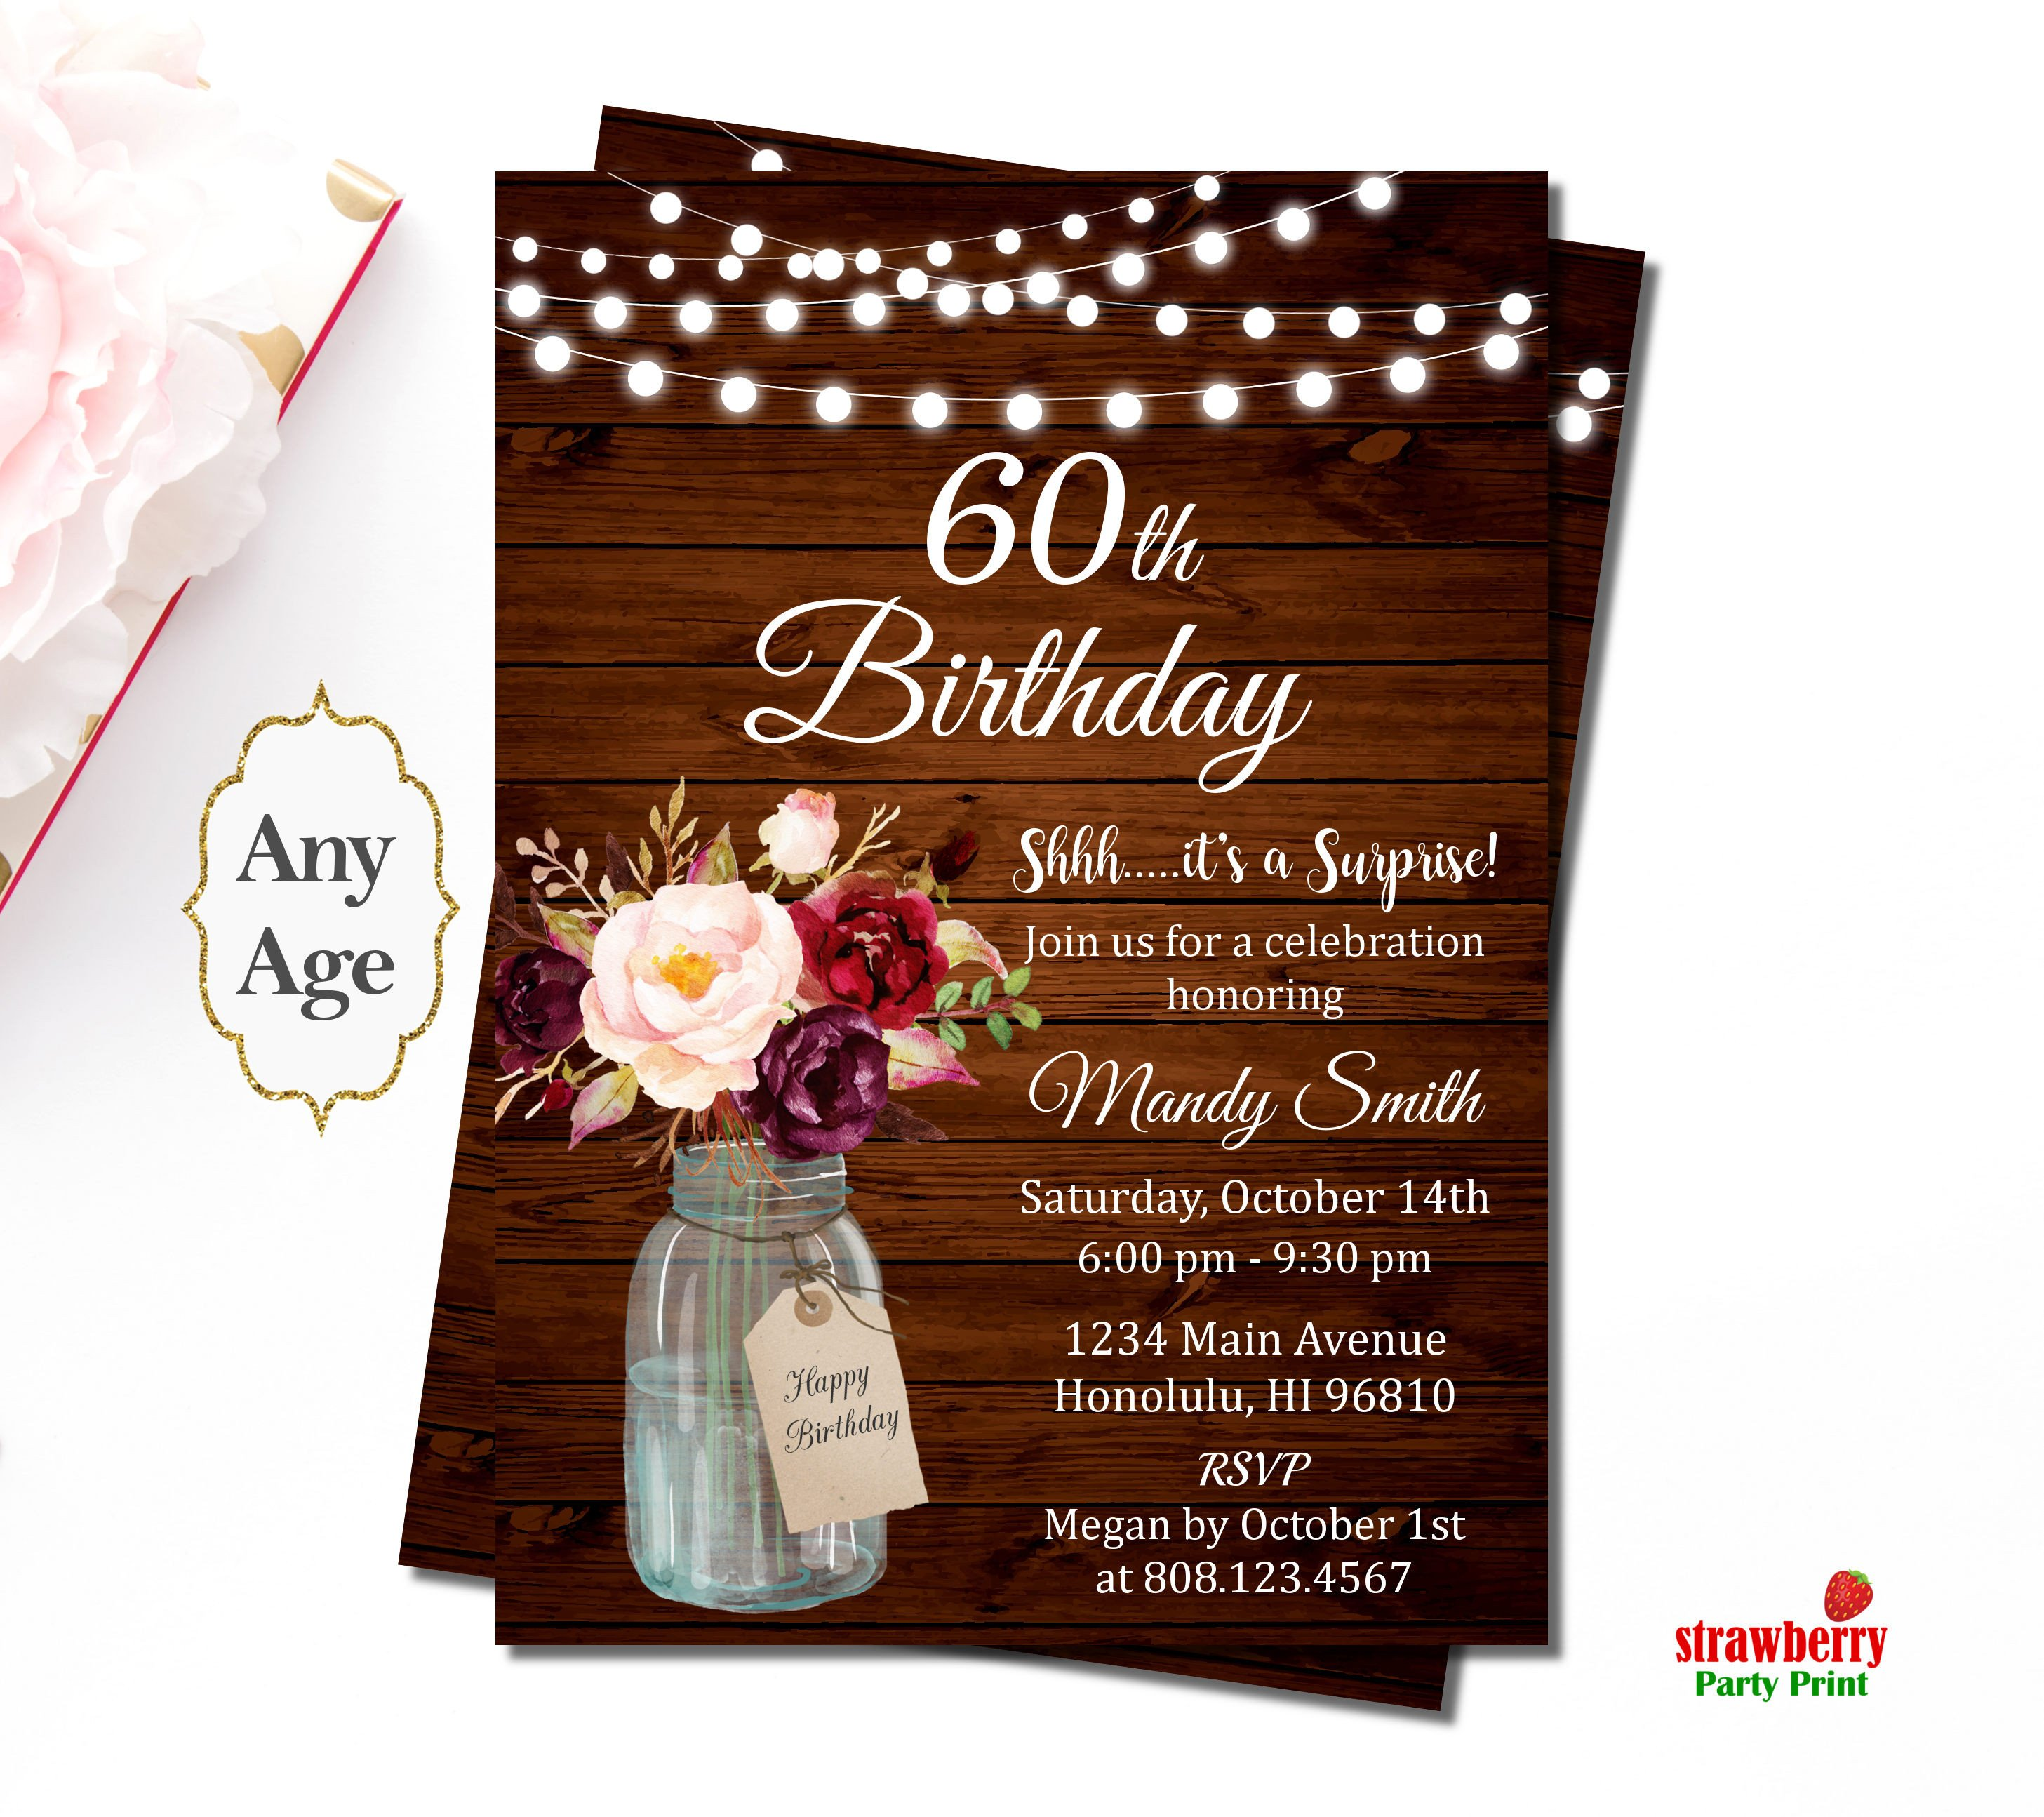 60 Th Birthday Invites 60th Birthday Invitations for Women Surprise 60th Birthday